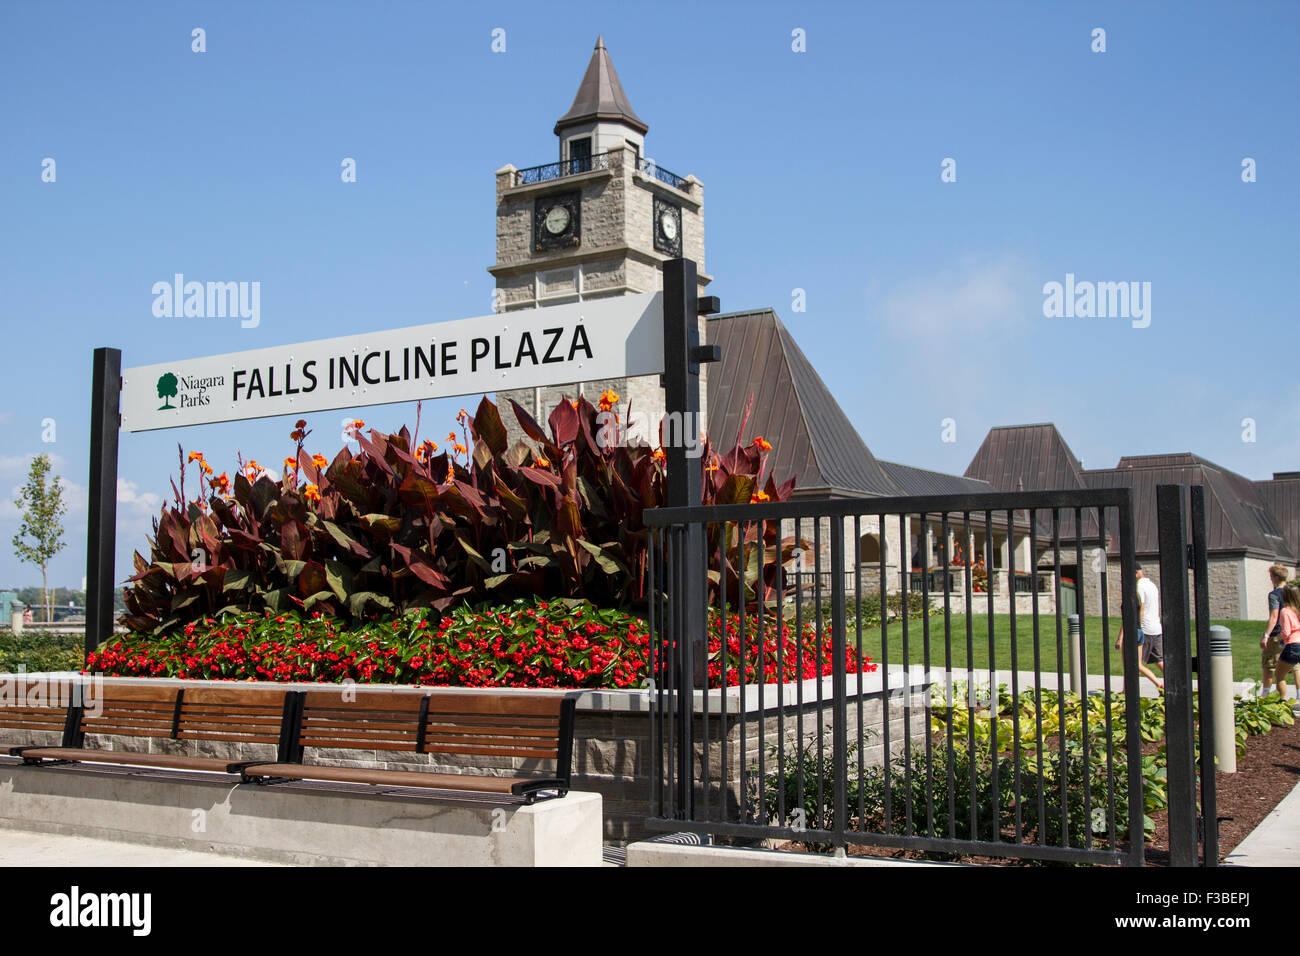 Niagara Falls Incline Plaza - Stock Image